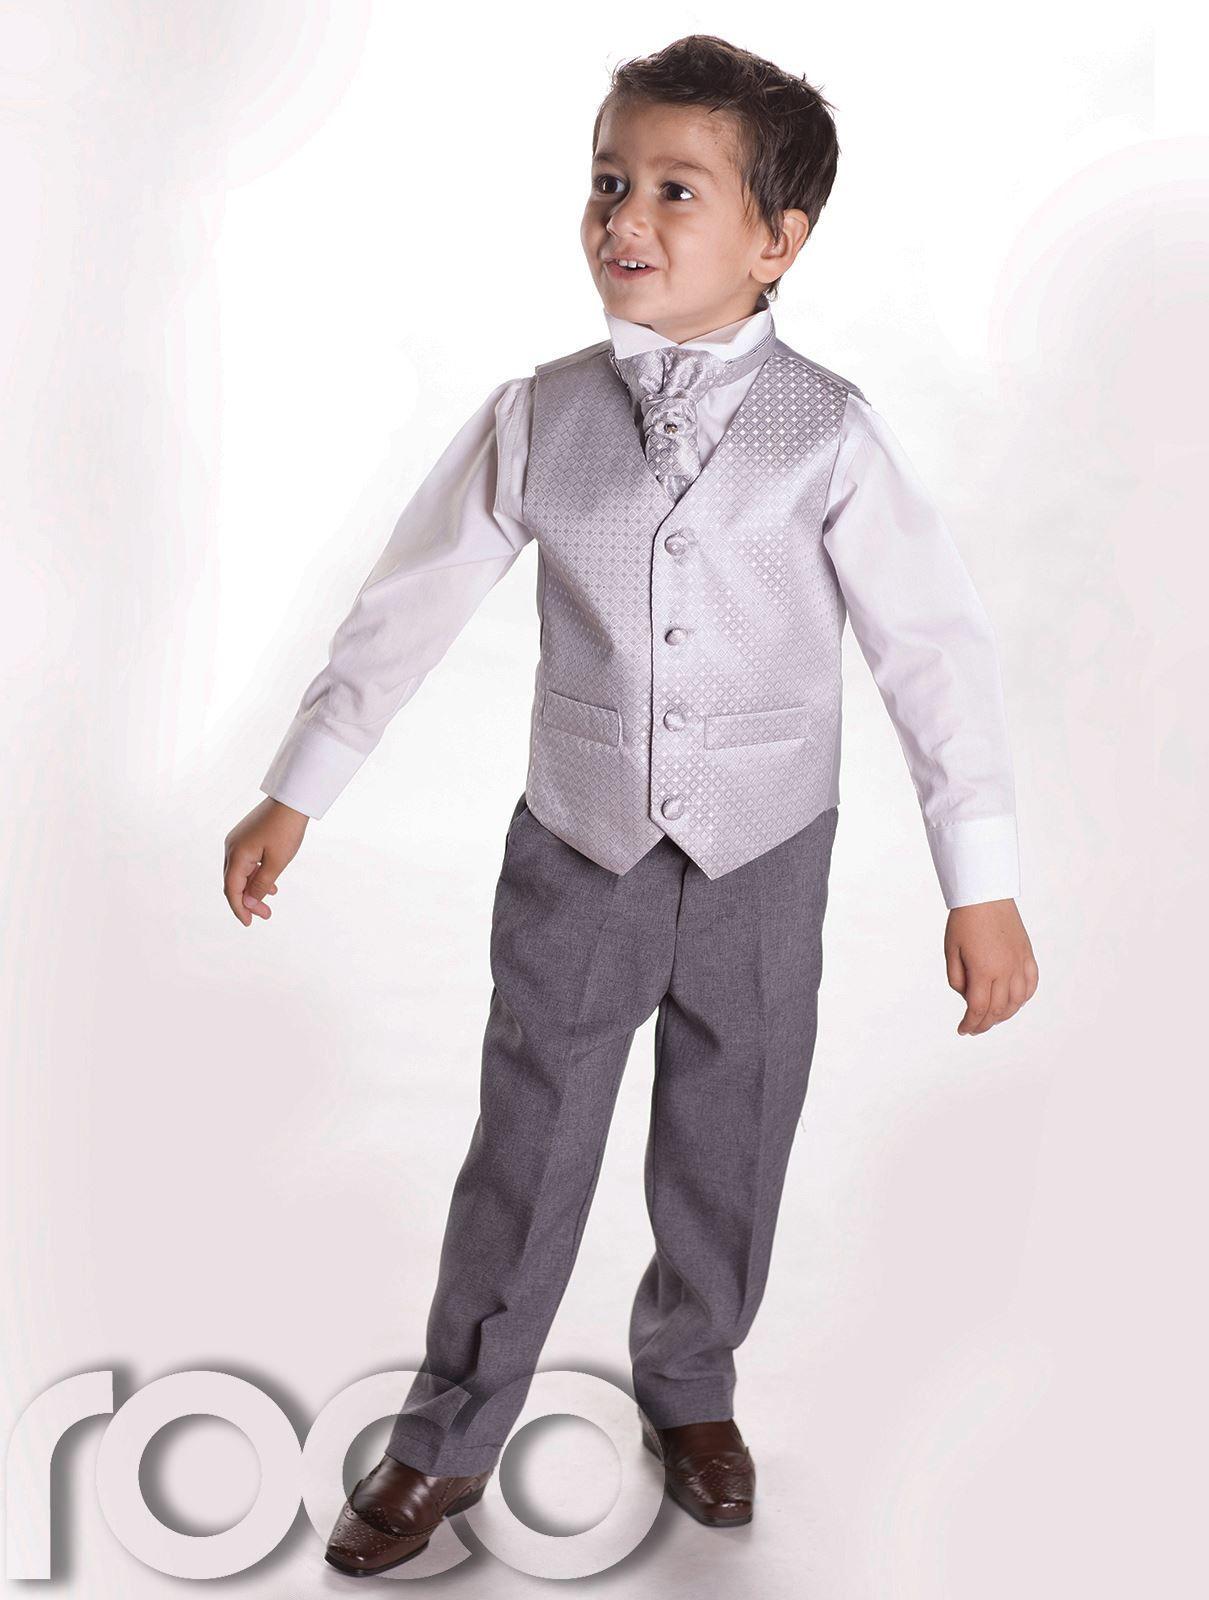 Boys Waistcoat Suit, Boys Wedding Suits, Page Boy Suits, Grey ...